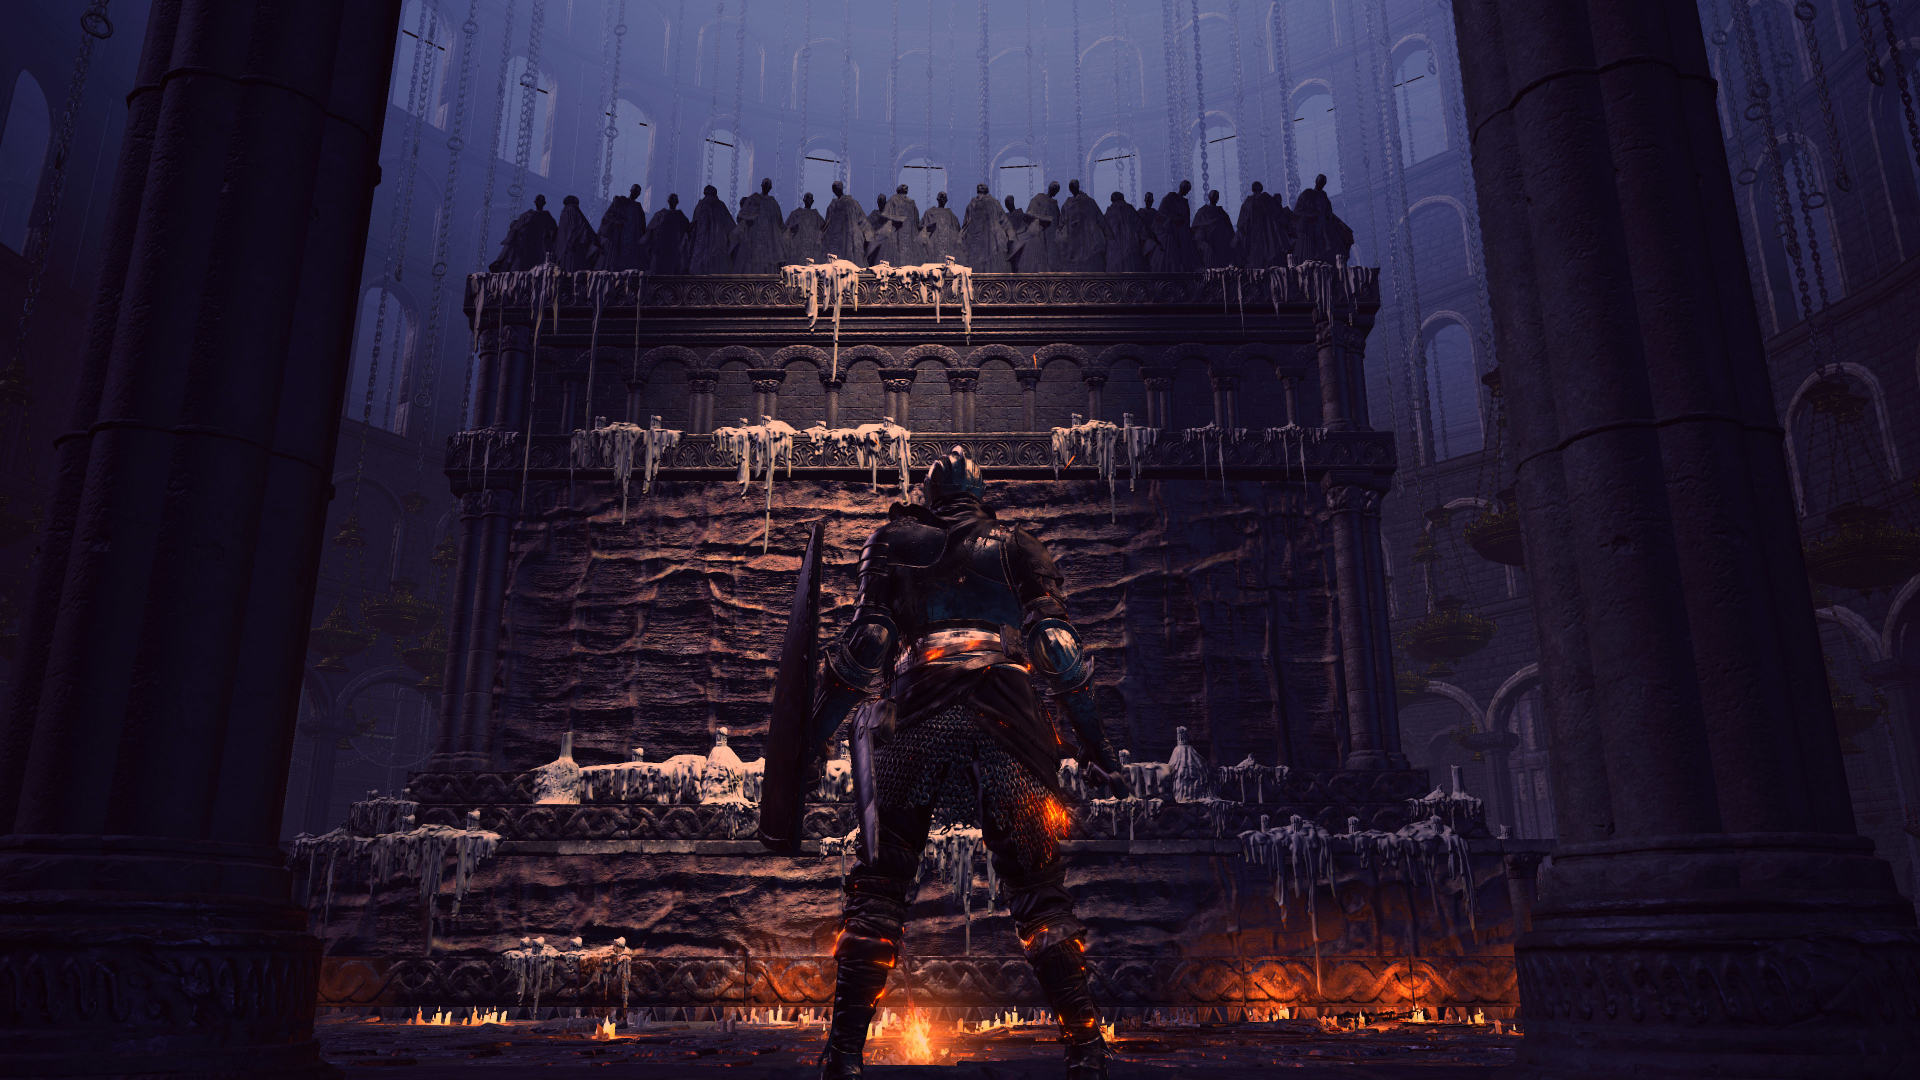 Download 1920x1080 Wallpaper Warrior Video Game Dark Souls Full